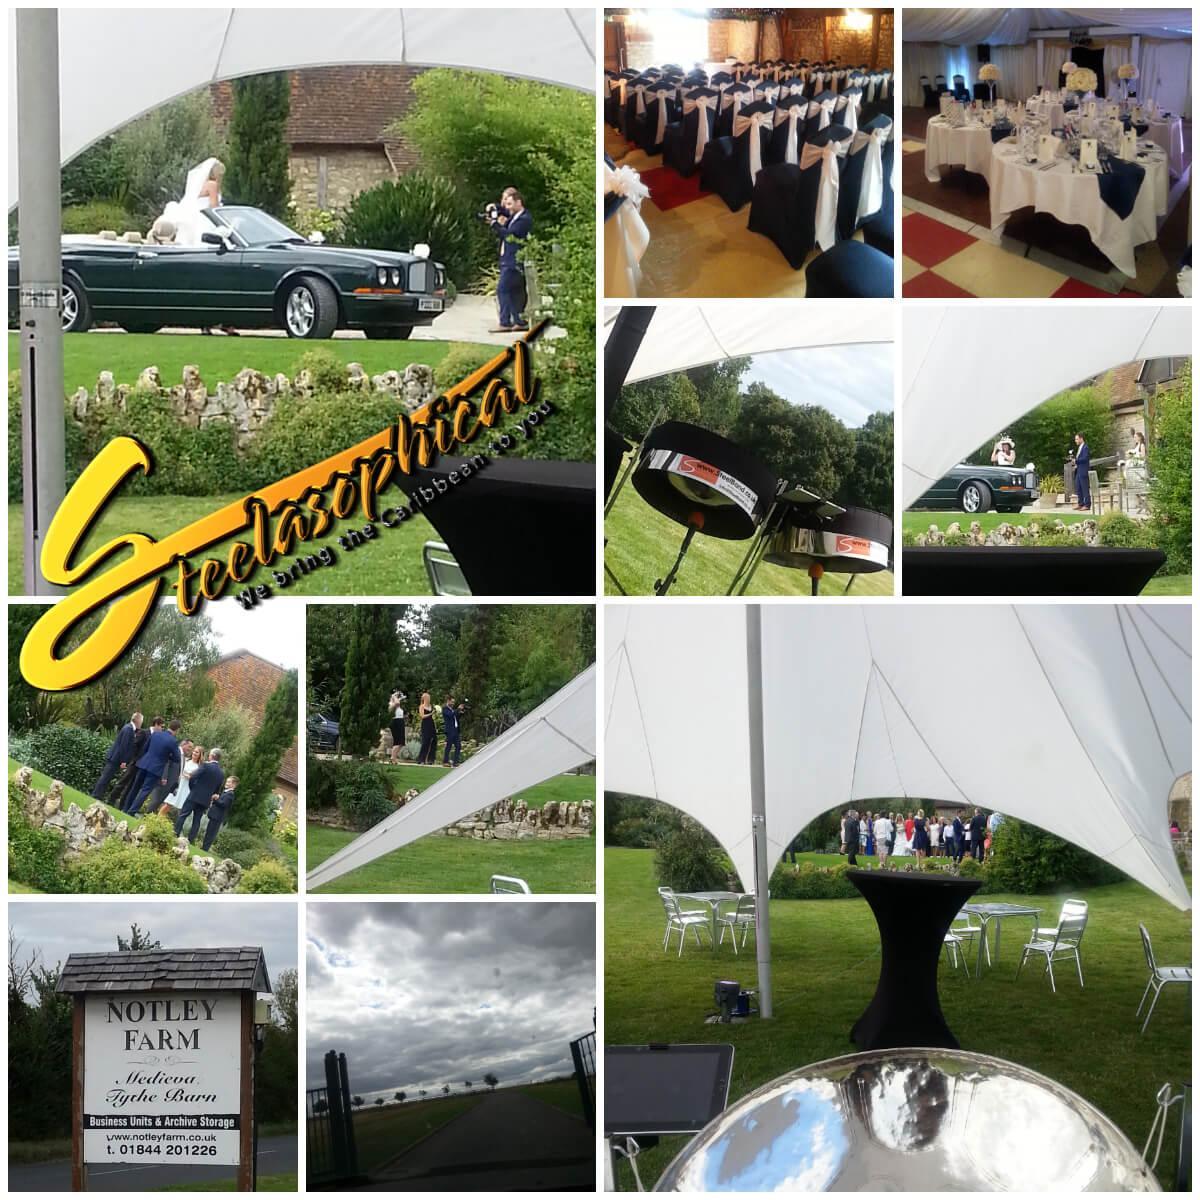 Steelasophical steel band wedding Notely Farm